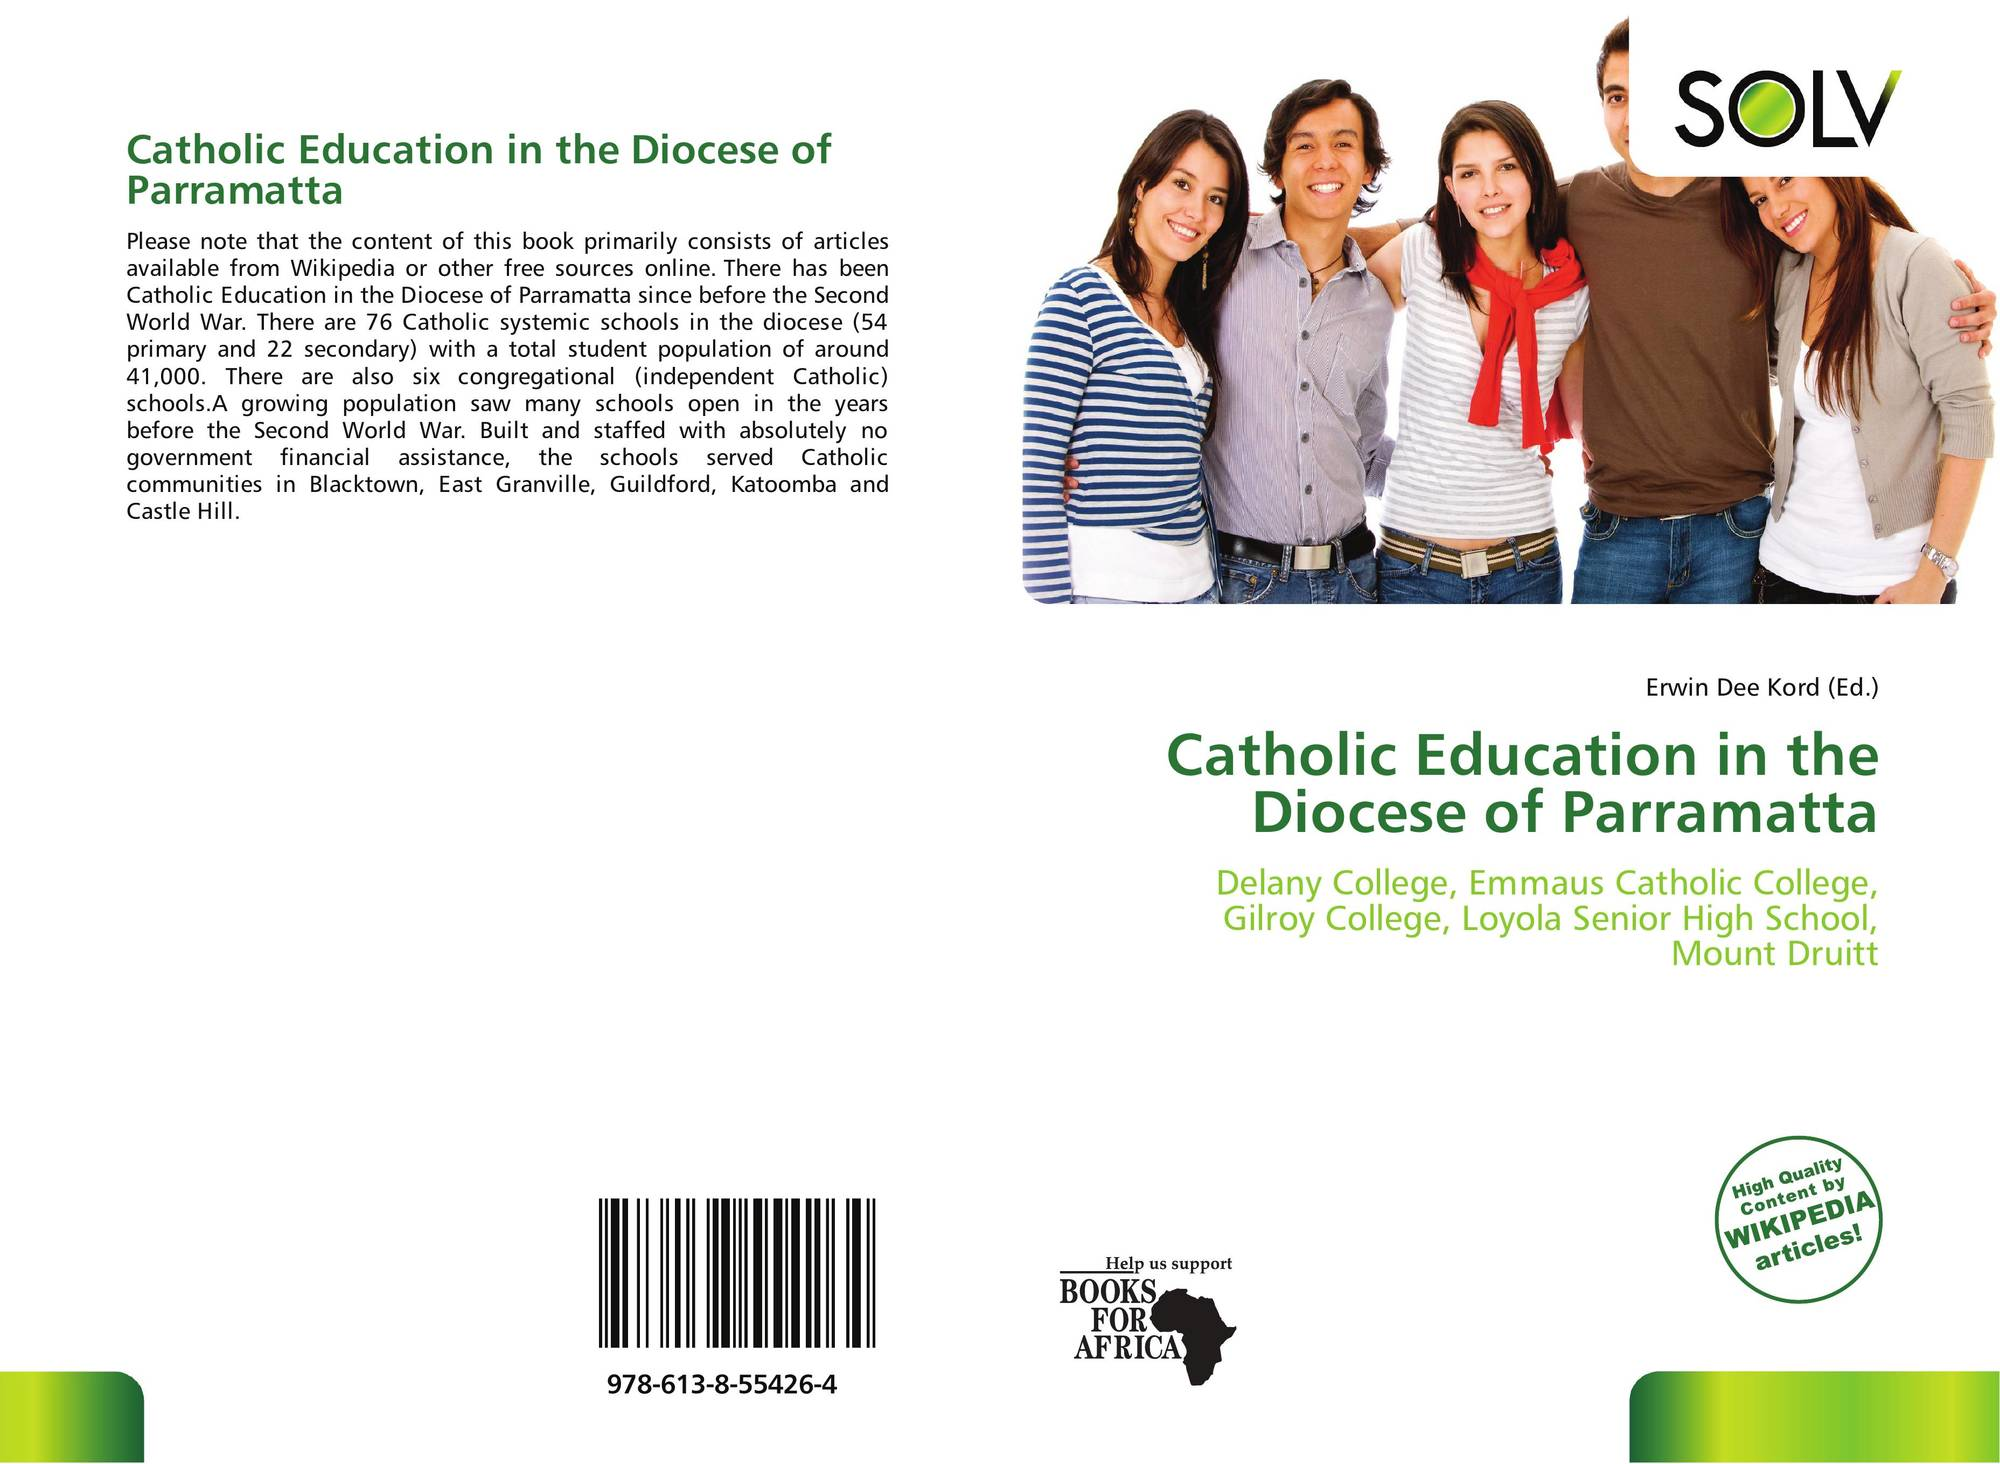 Parramatta catholic education